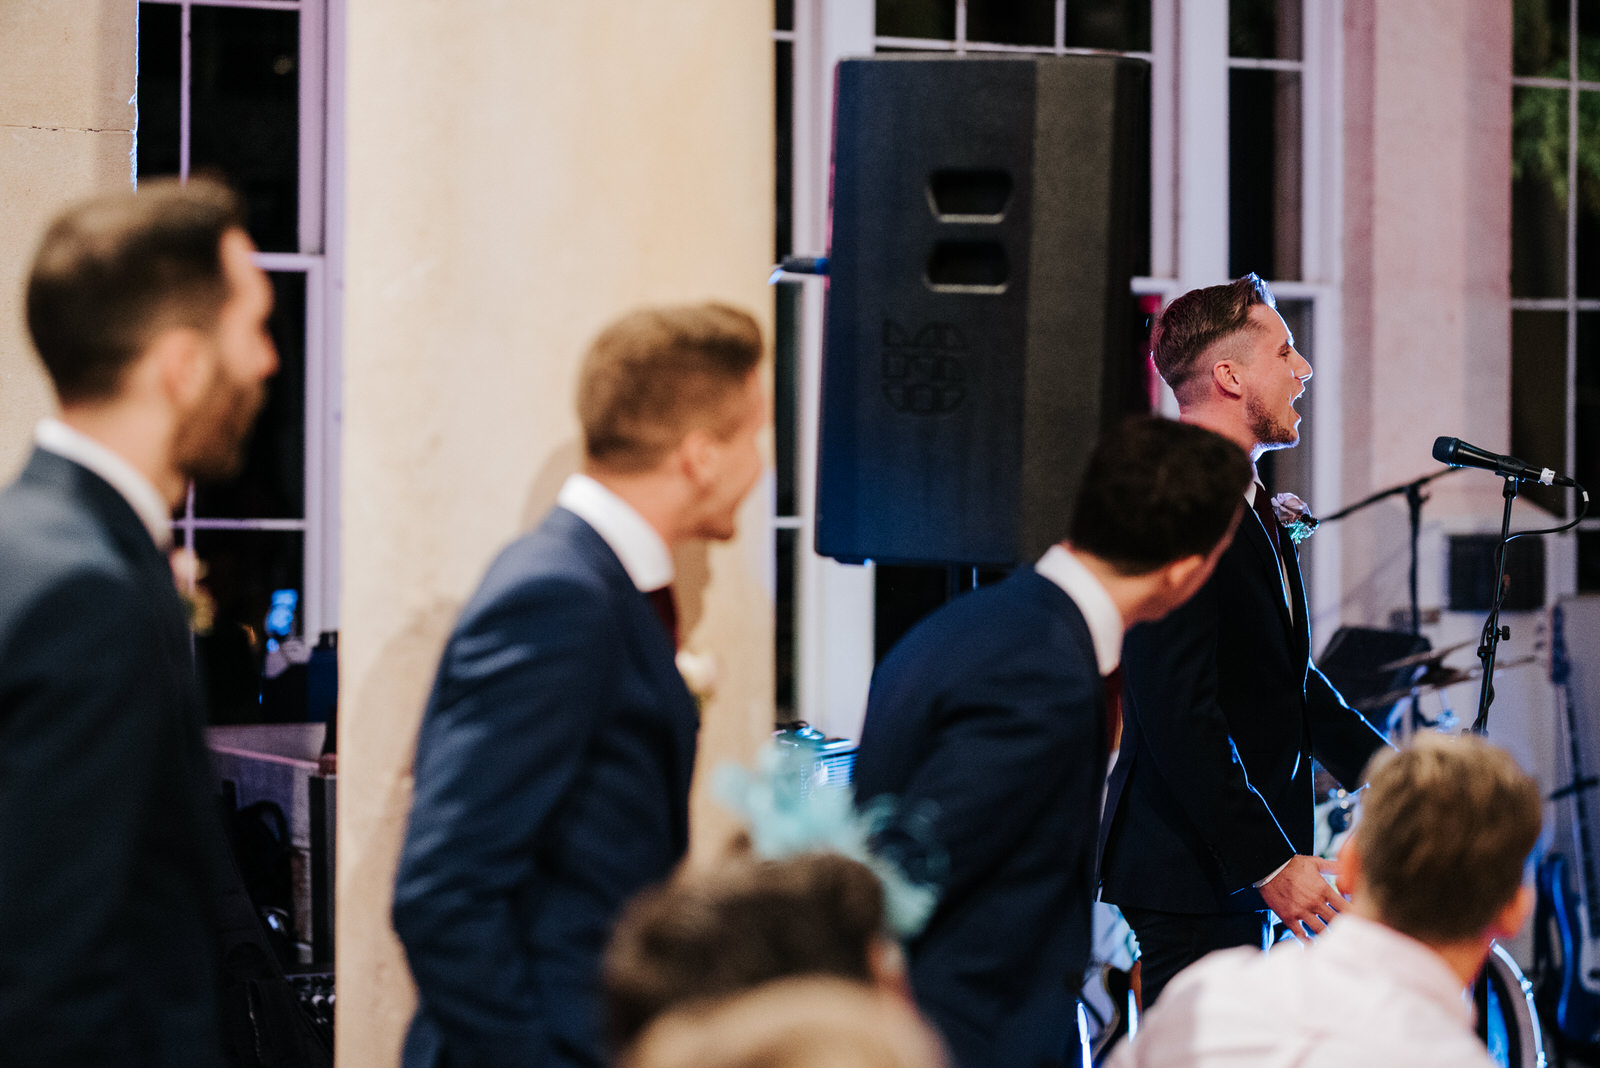 Groomsmen take turns delivering their wedding speeches